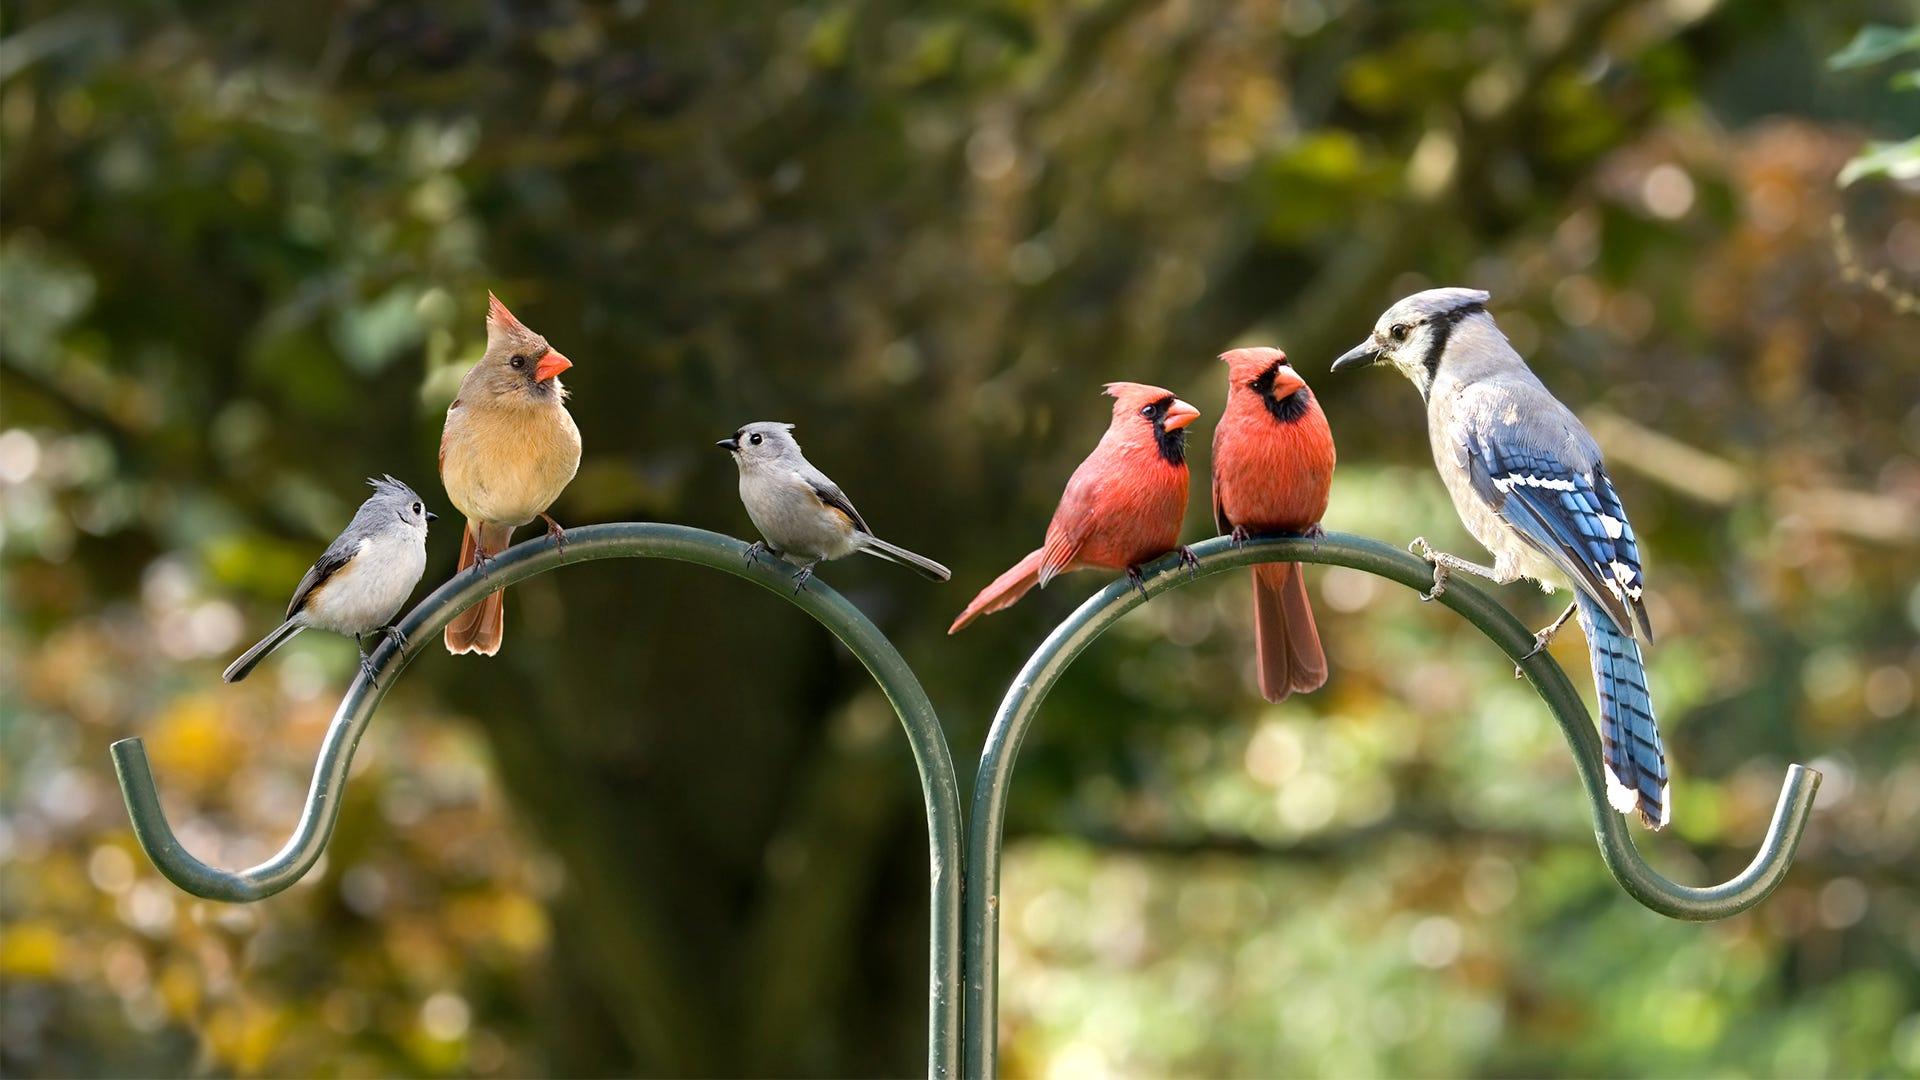 Celebrate National Bird Feeding Month